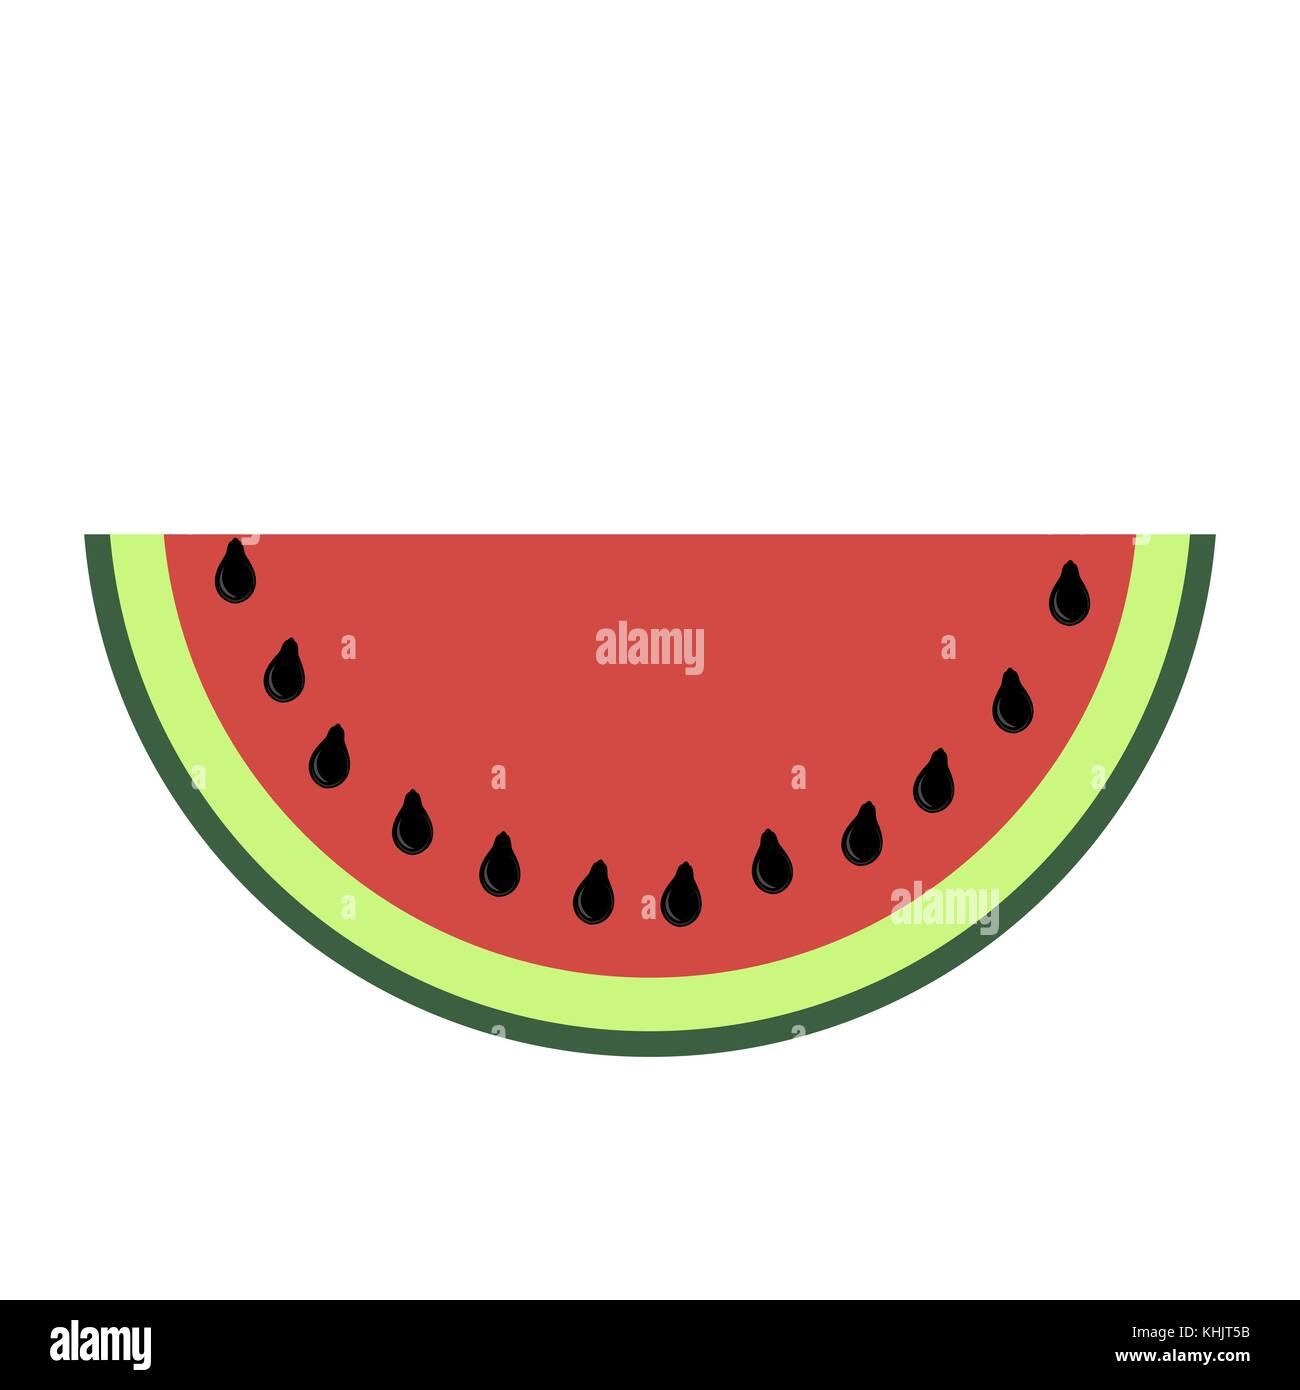 Fresh Slaced Ripe Watermelon on White Background - Stock Image